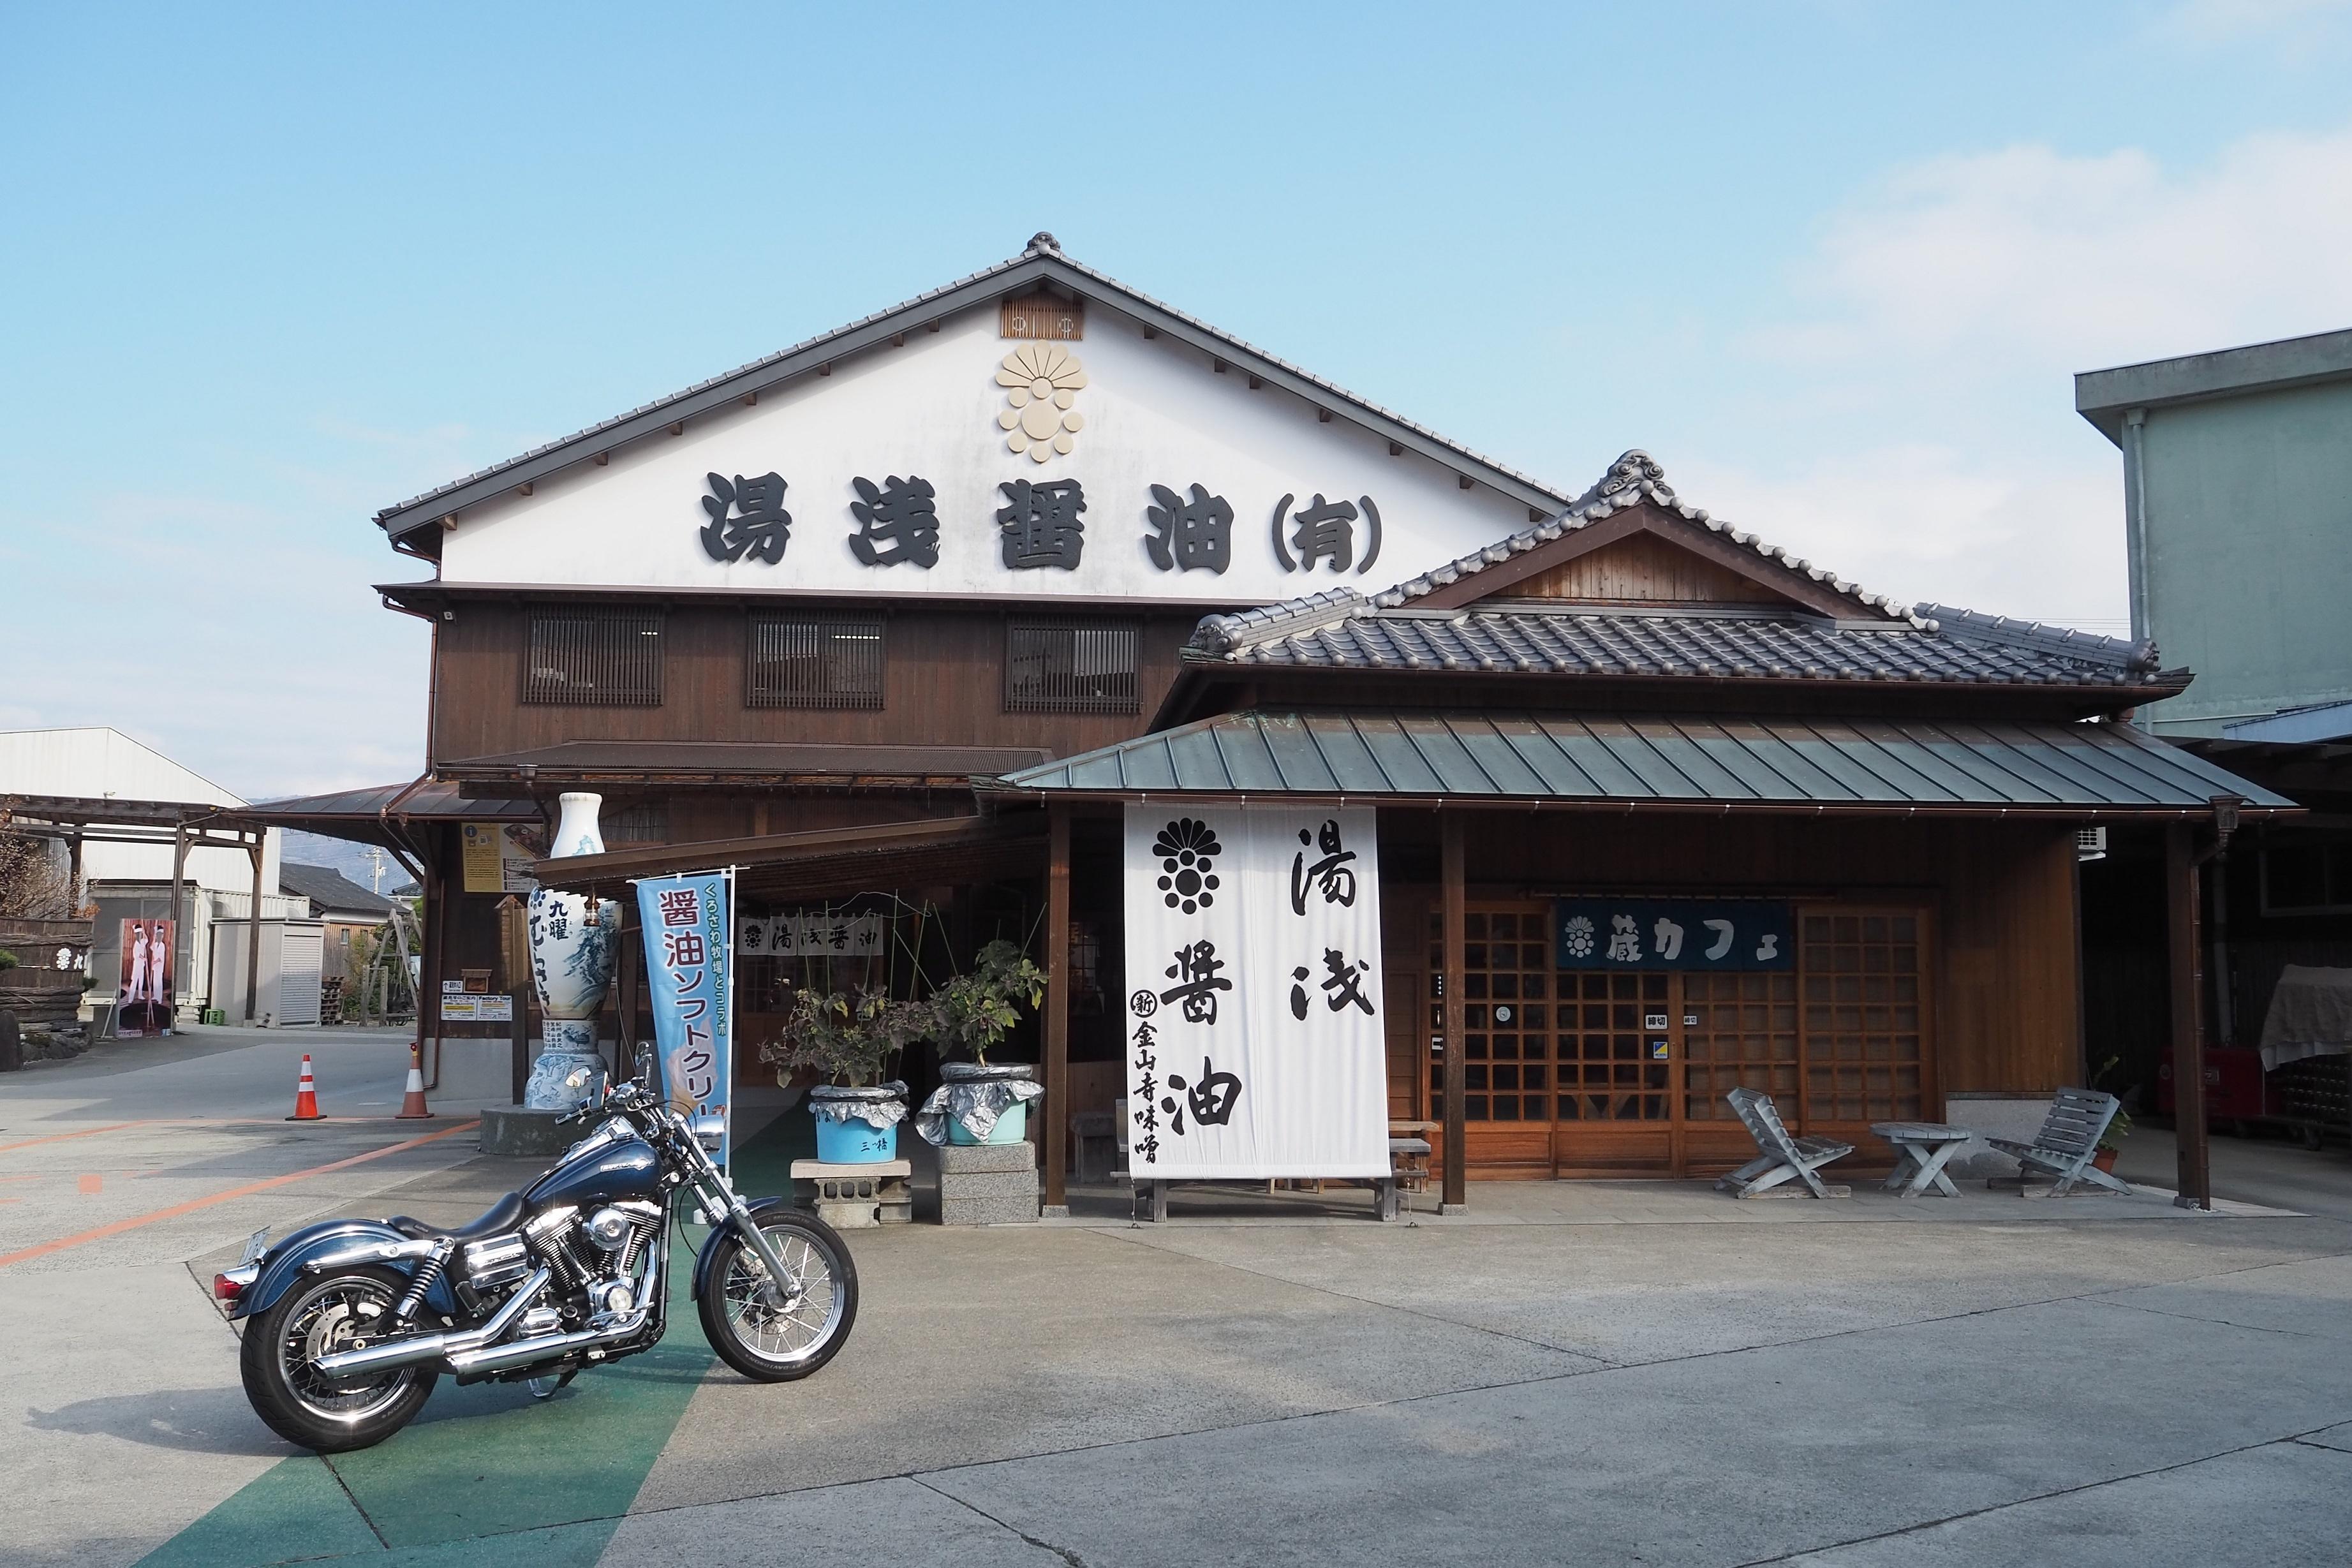 harleydavidson-motorcycle-touring-blog-wakayama-yuasashouyu-soysauce.jpg